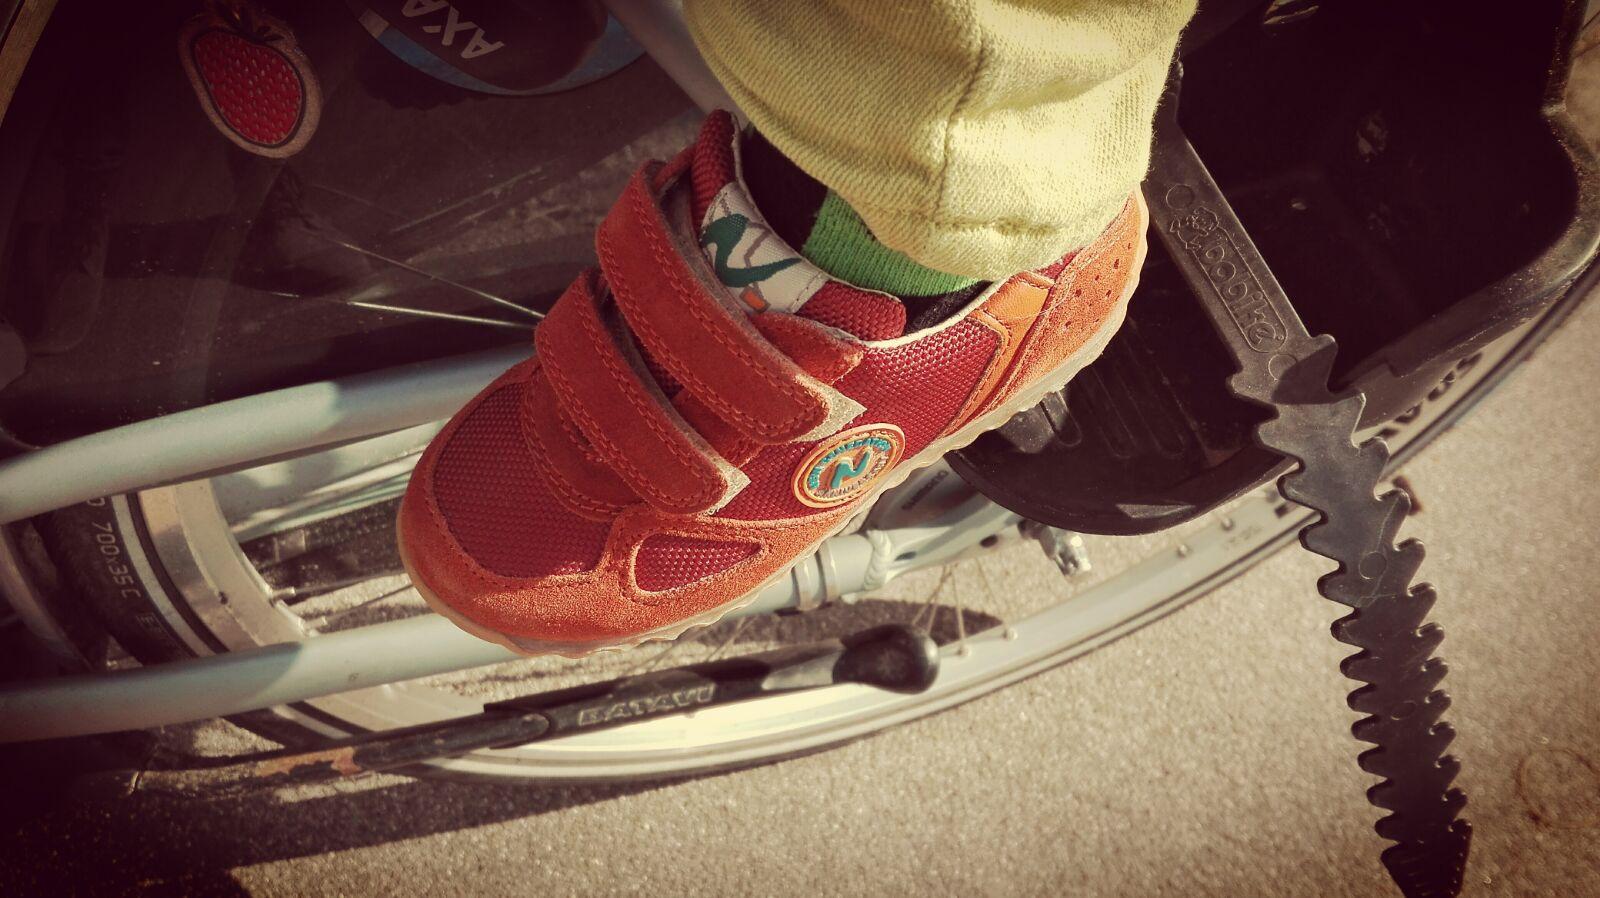 5-16-naturino-schoenen-kleuter-sneakers-oranje-klittenband-goed--mooi-nanny-moeder-amsterdam-blog-review